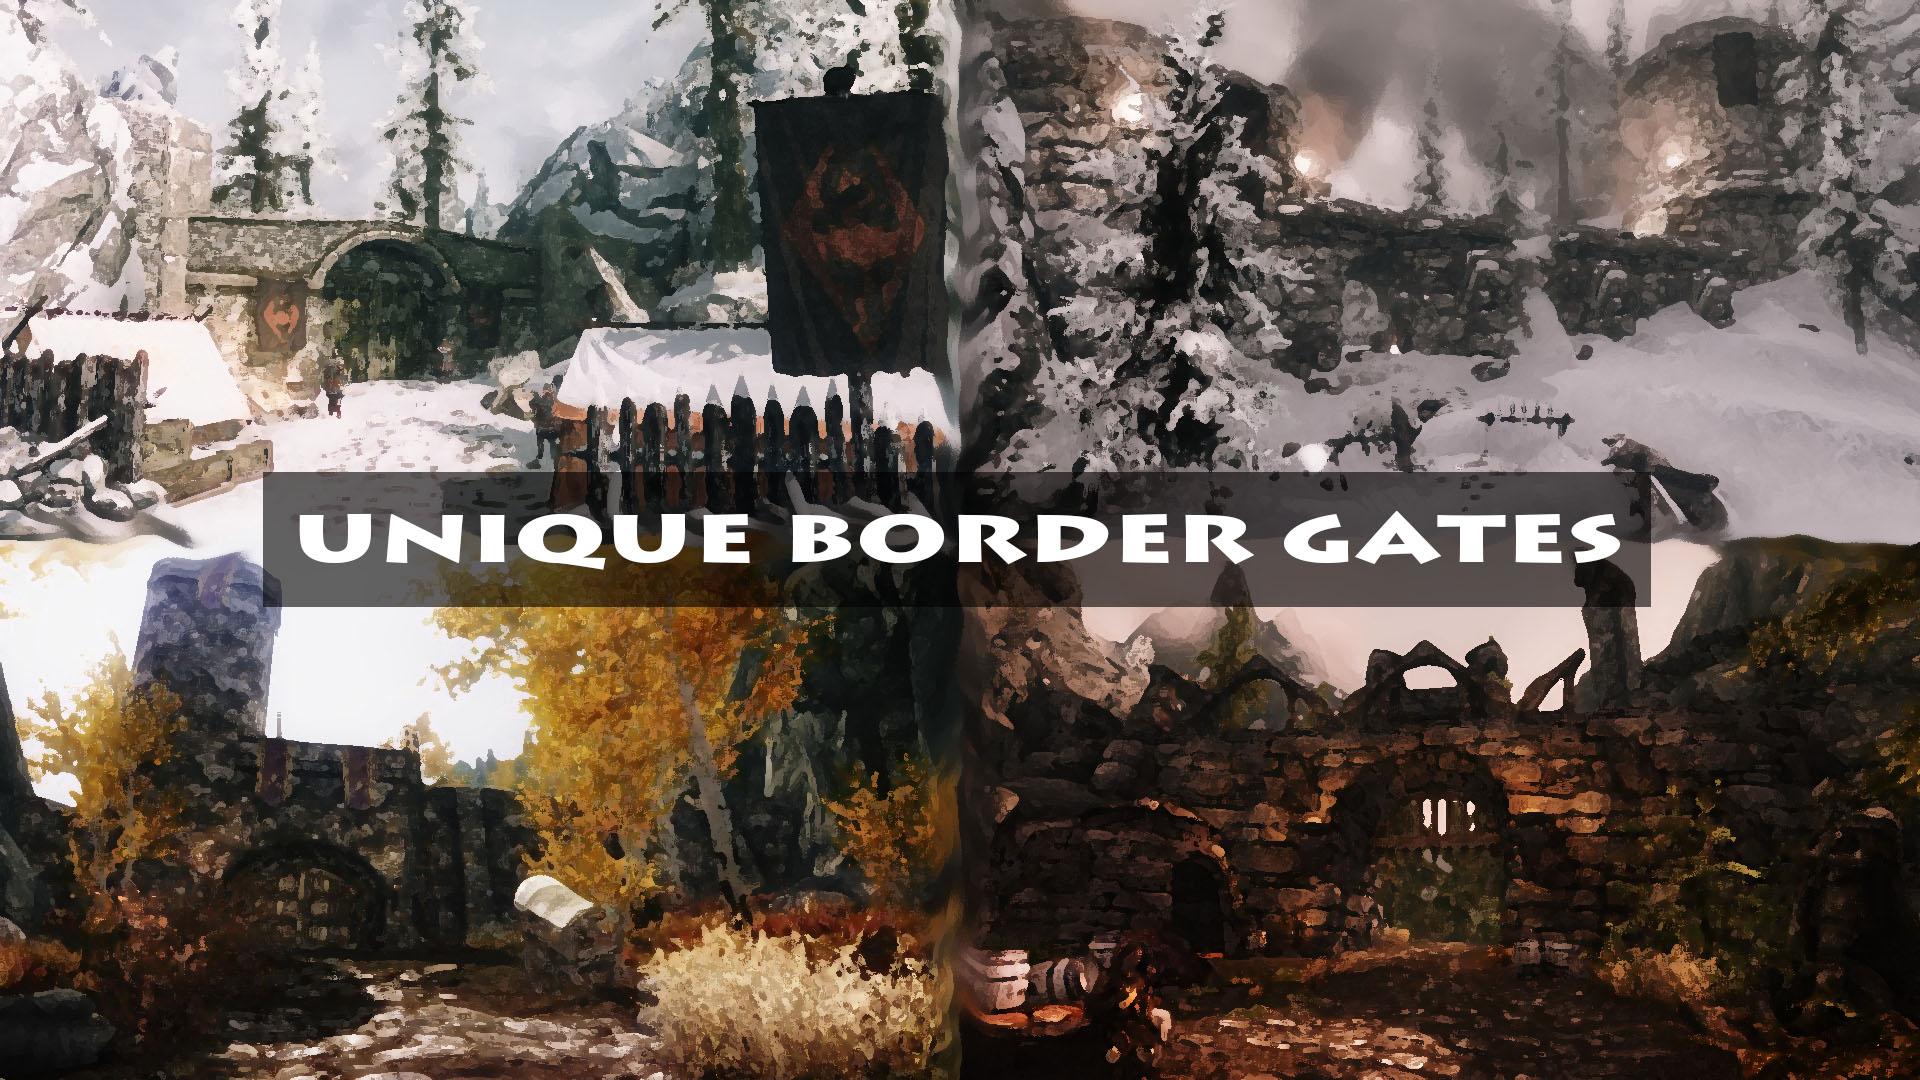 Unique Border Gates